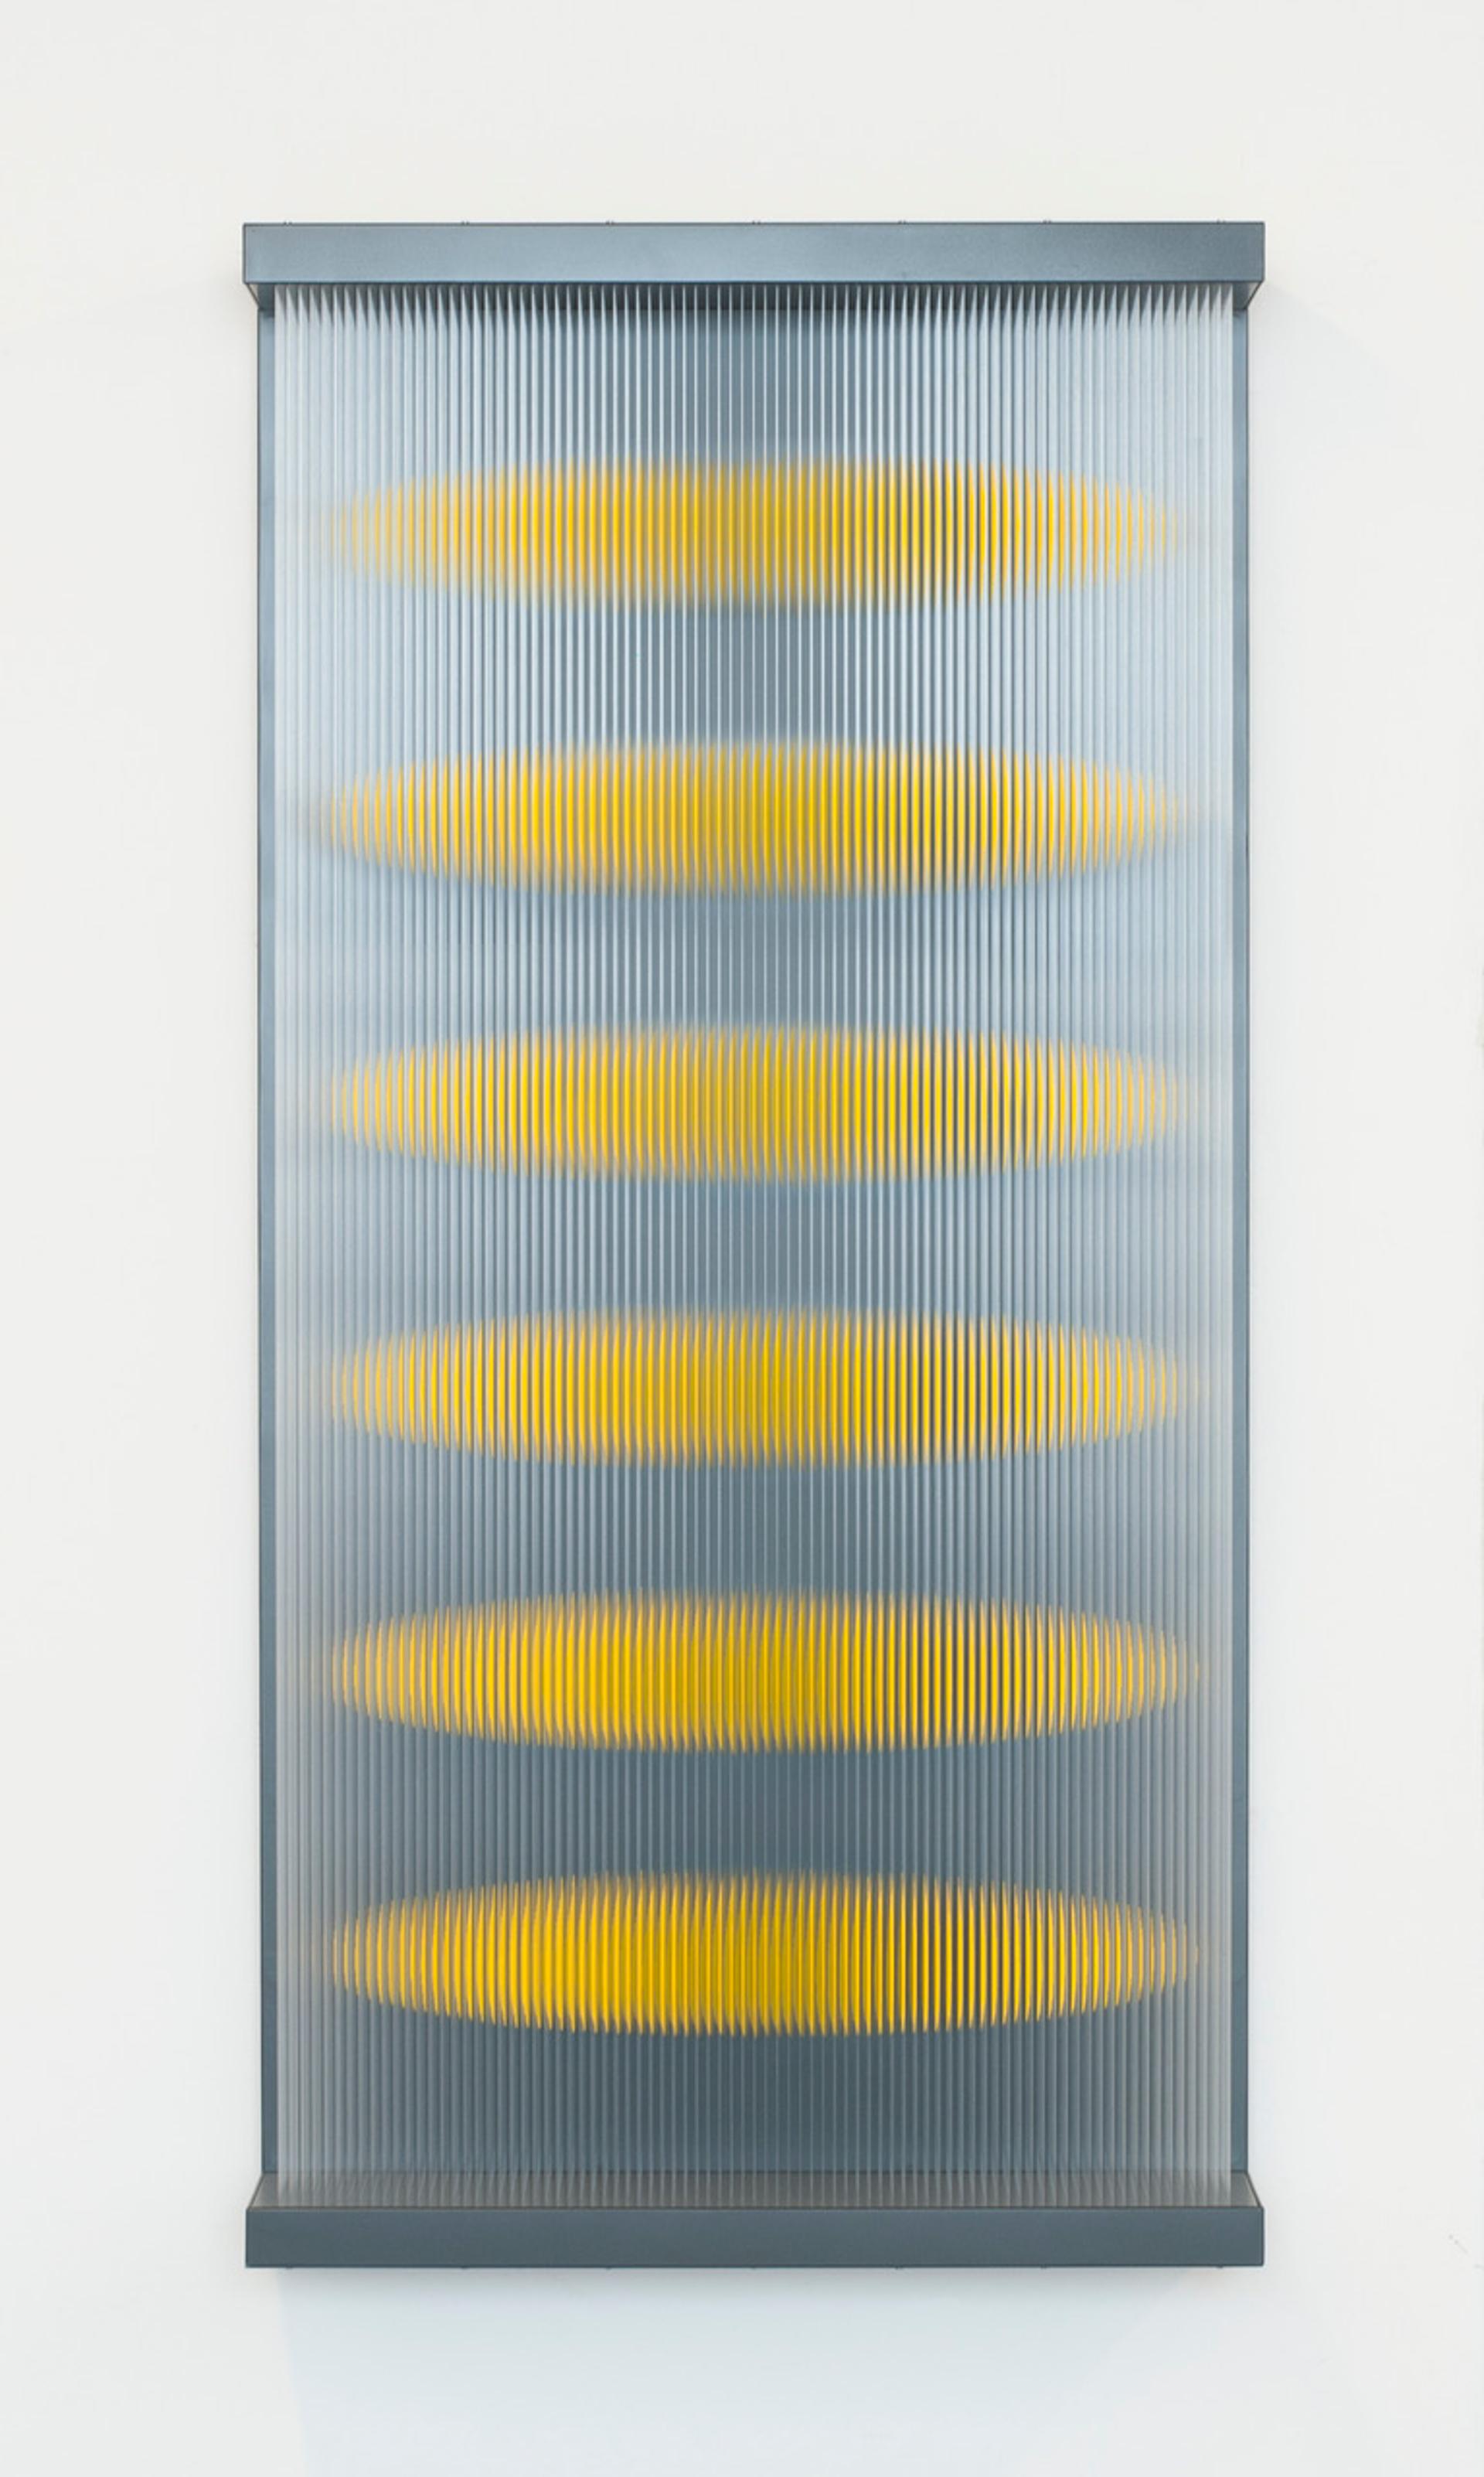 Six Gelb Rotationsellipsoid Wandarbeit by Yoshiyuki Miura